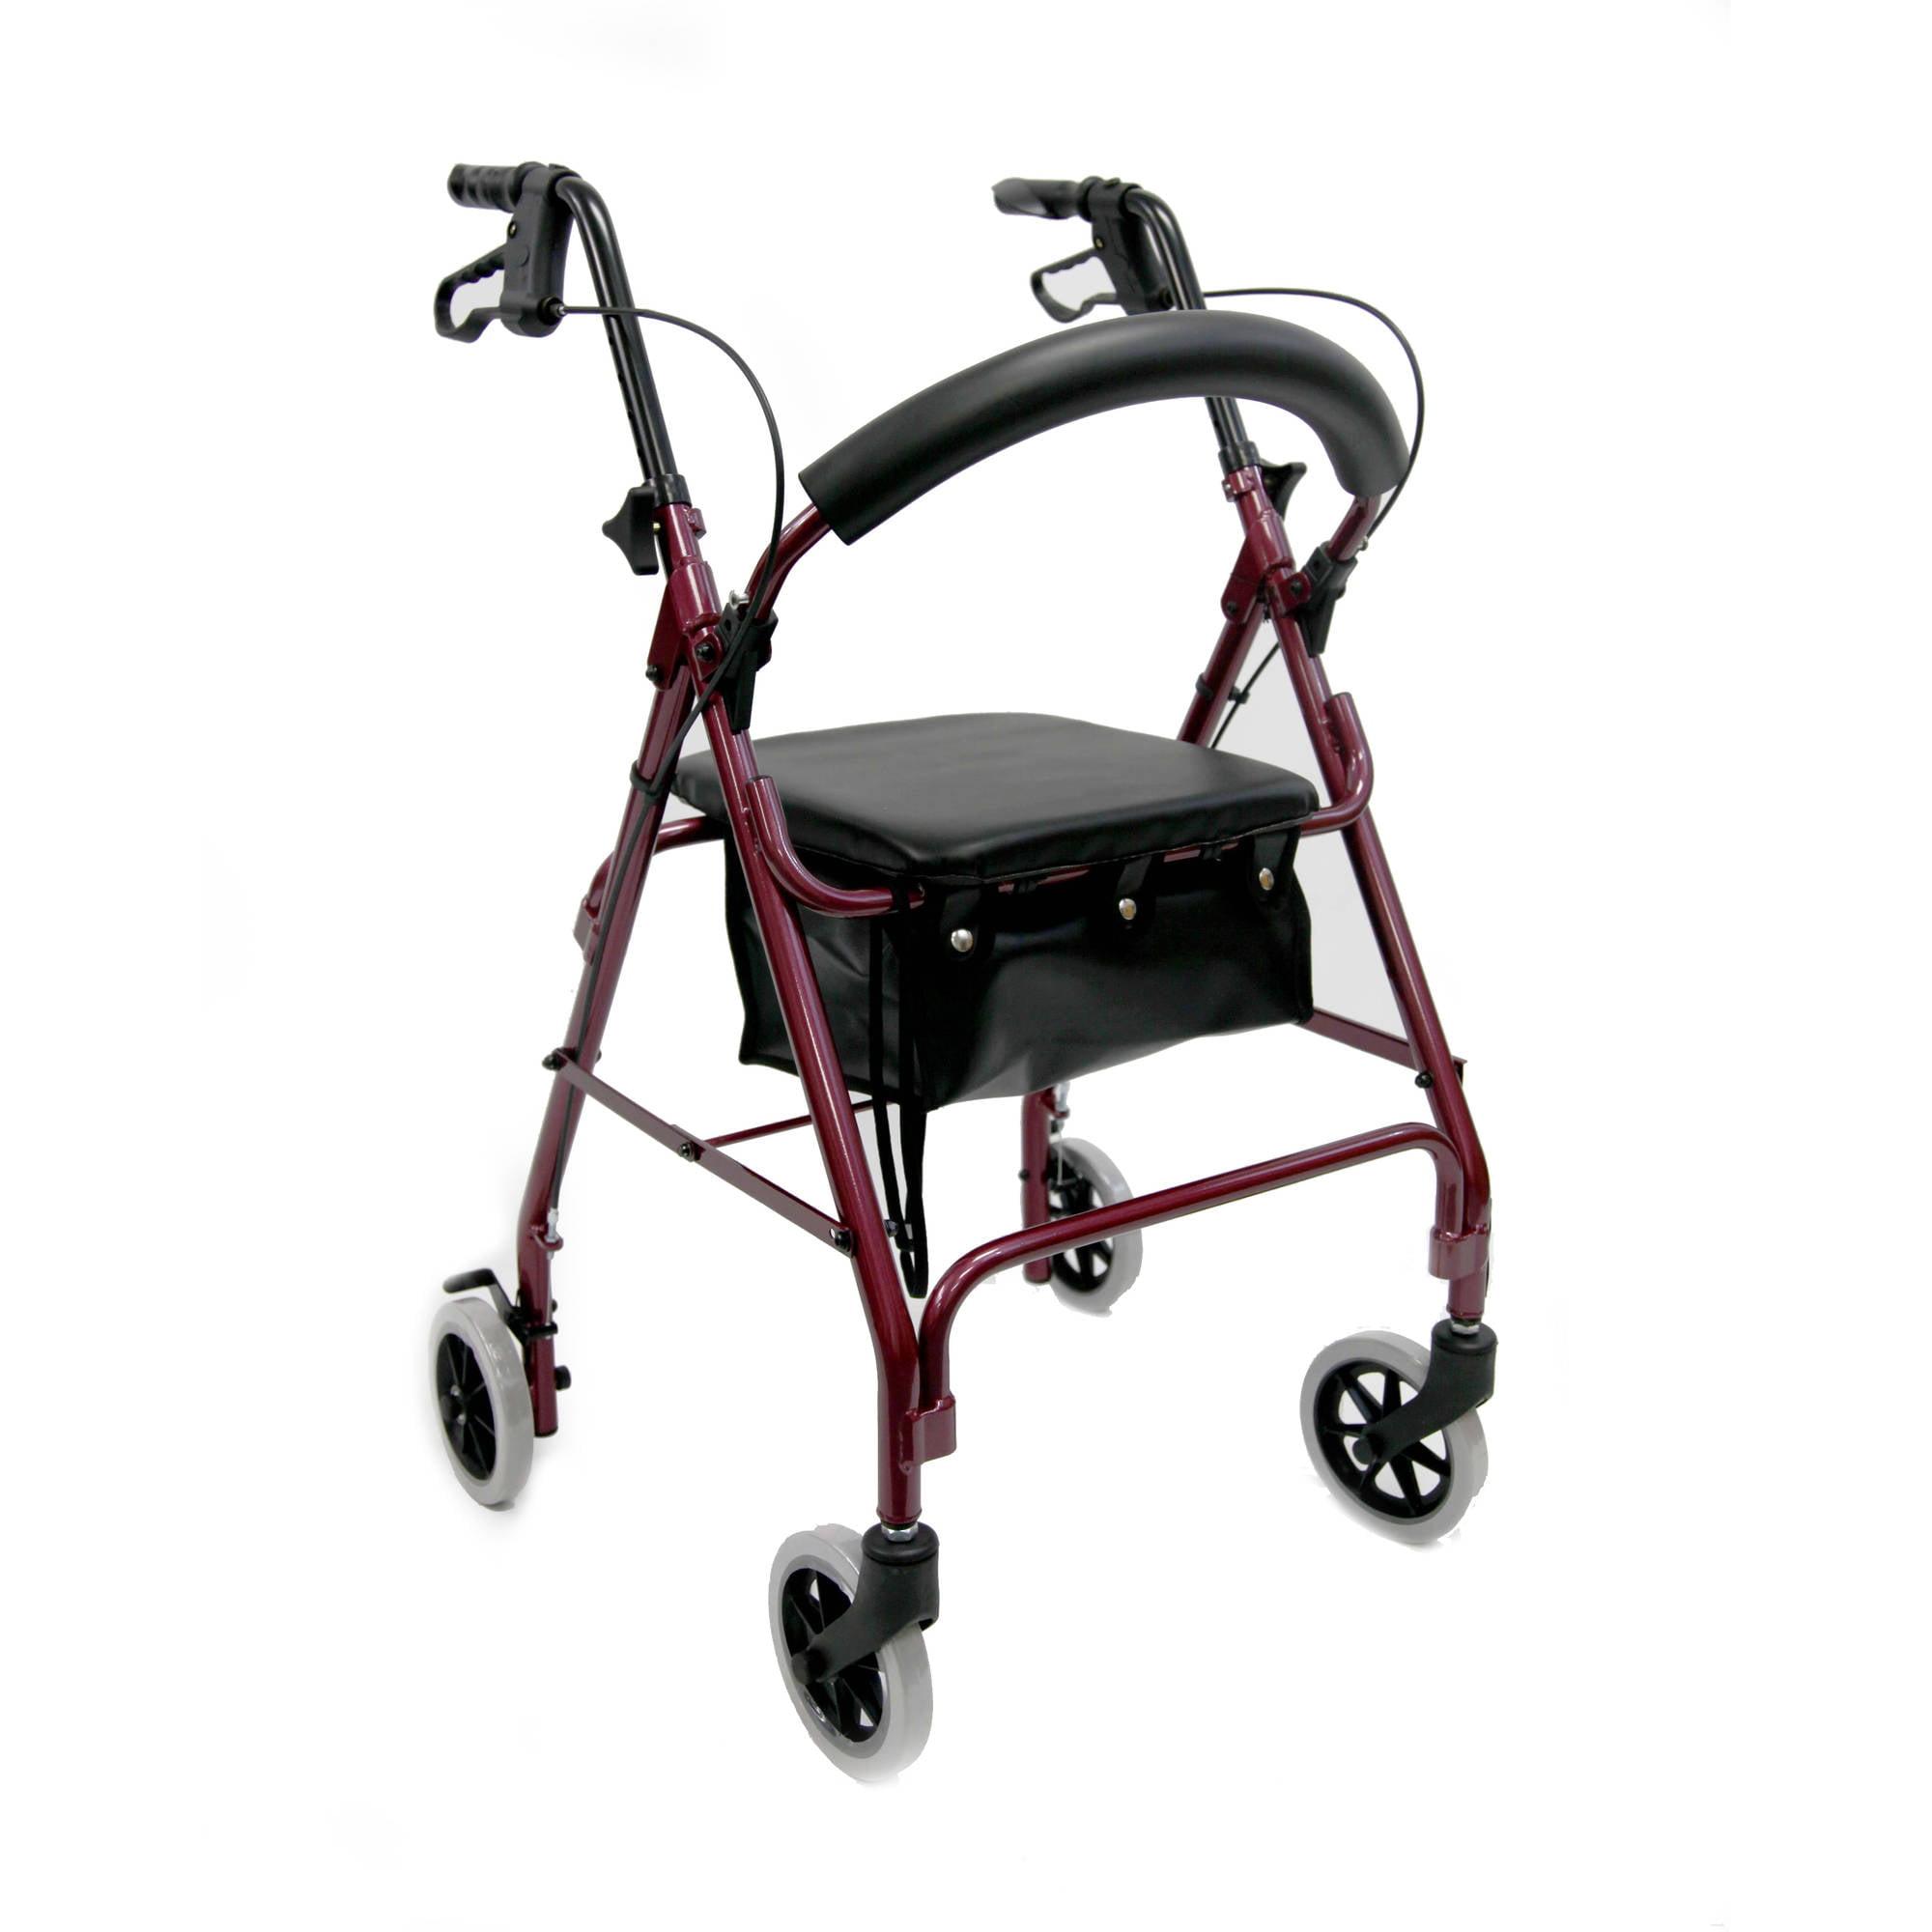 "Karman R-4600 Lightweight Rollator with 6"" Wheels, Padded Seat and Backrest, Cloth Basket, Burgundy"